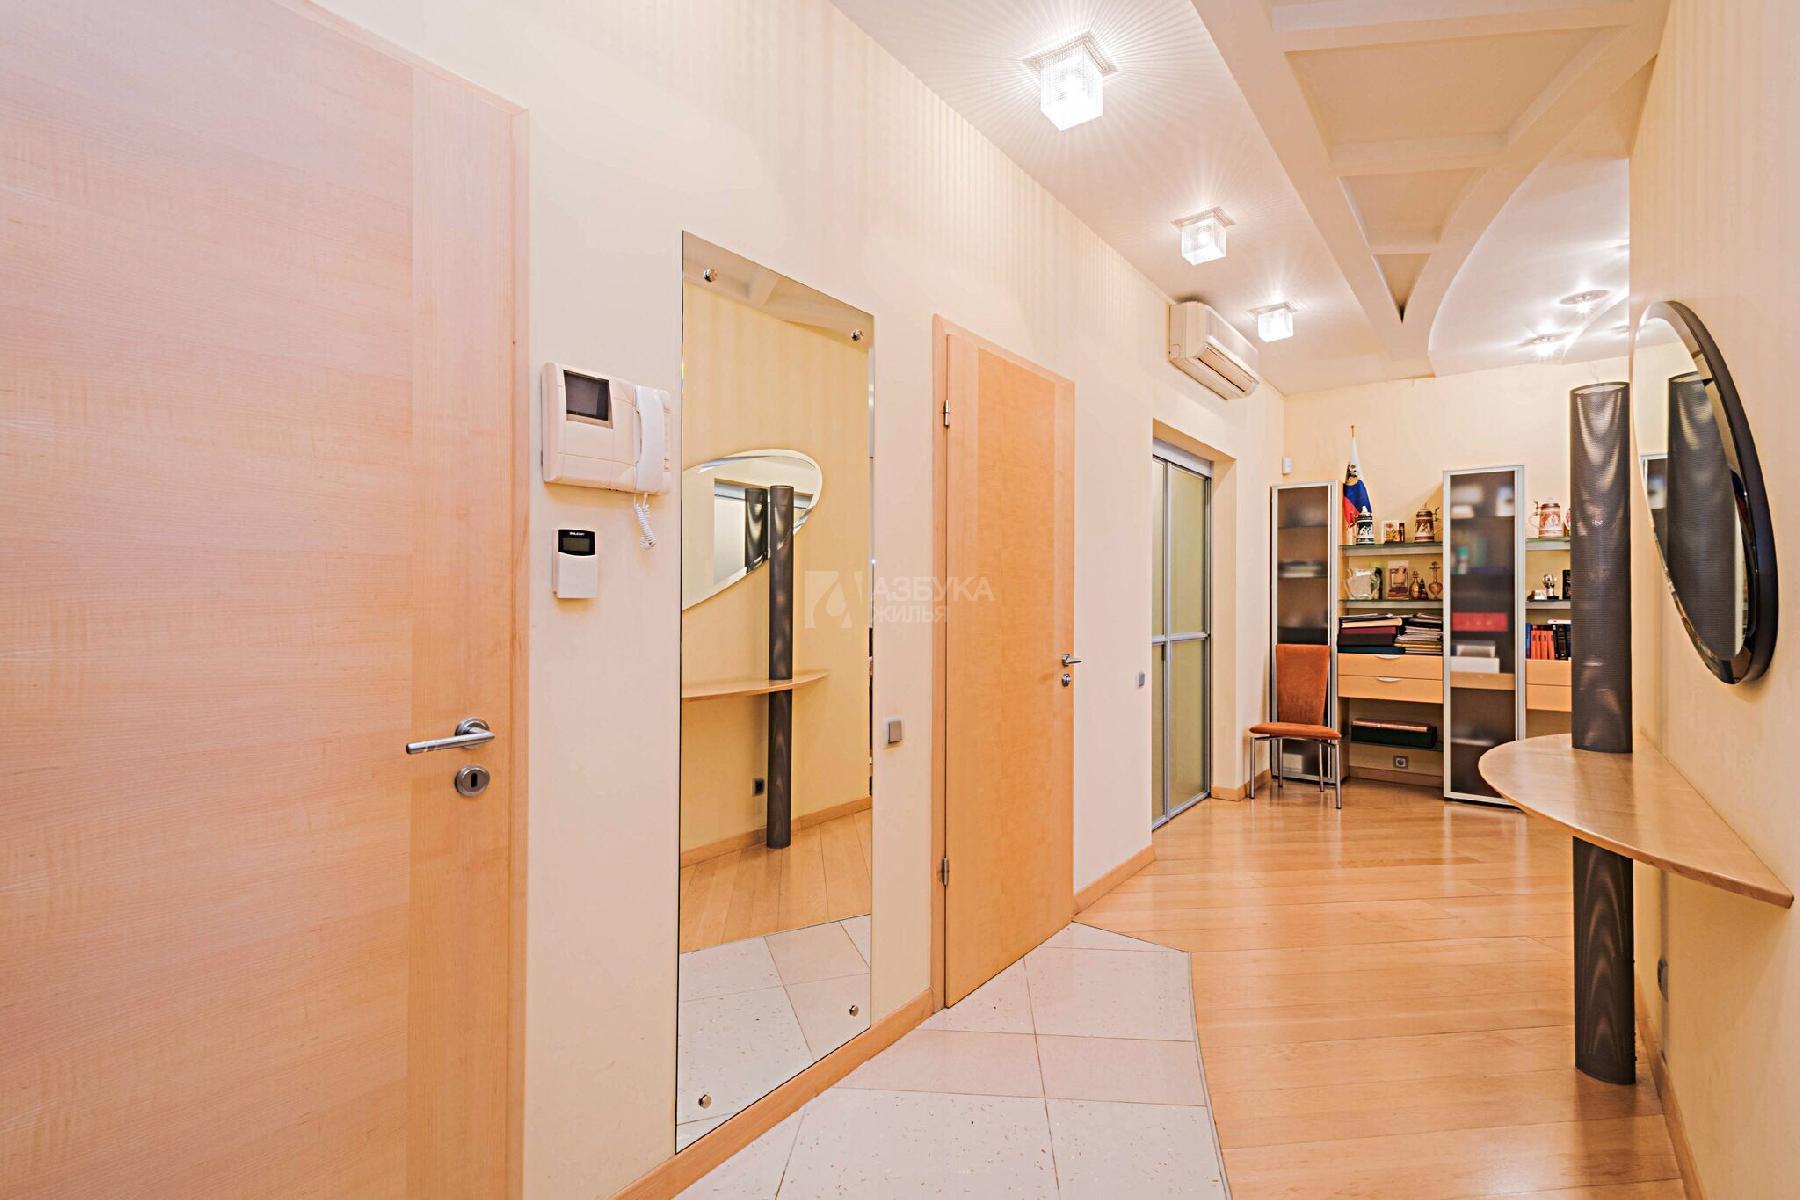 Фото №13 - 5-комнатная квартира, Москва, Авиационная улица 77, метро Щукинская